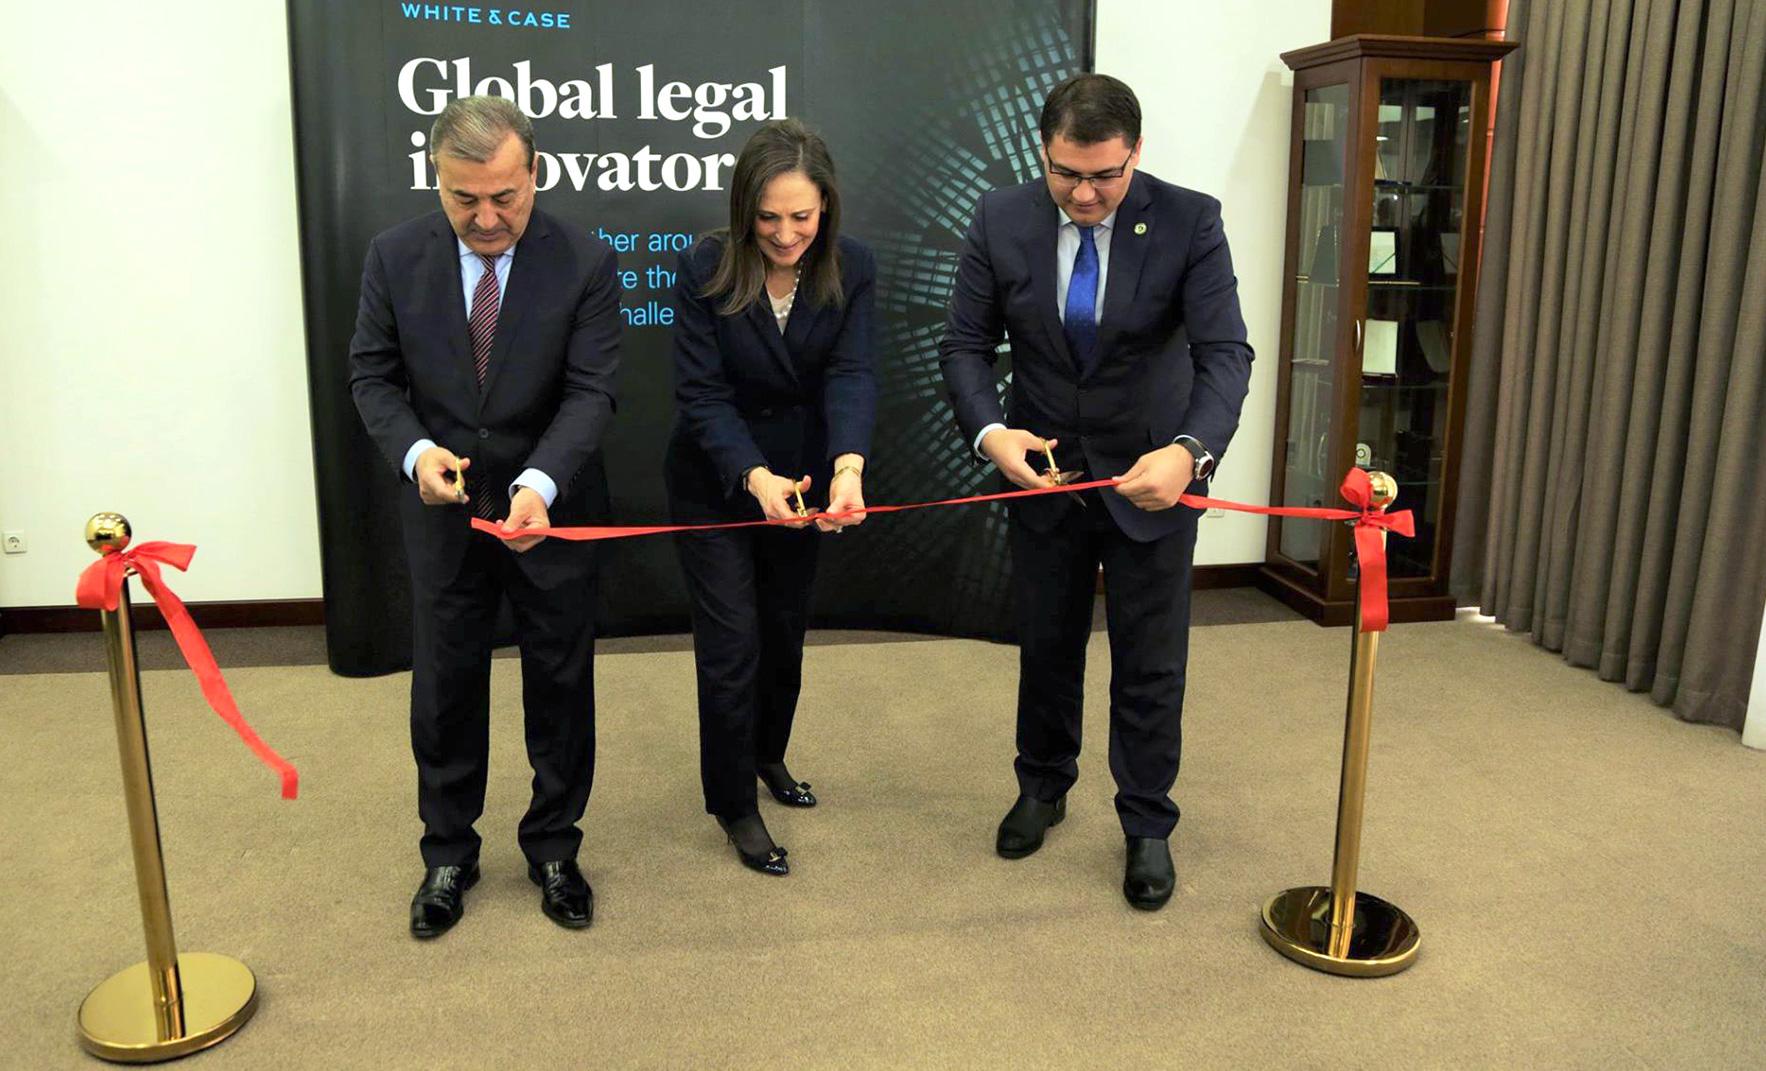 Major US companies set to enter Uzbekistani market, boost development